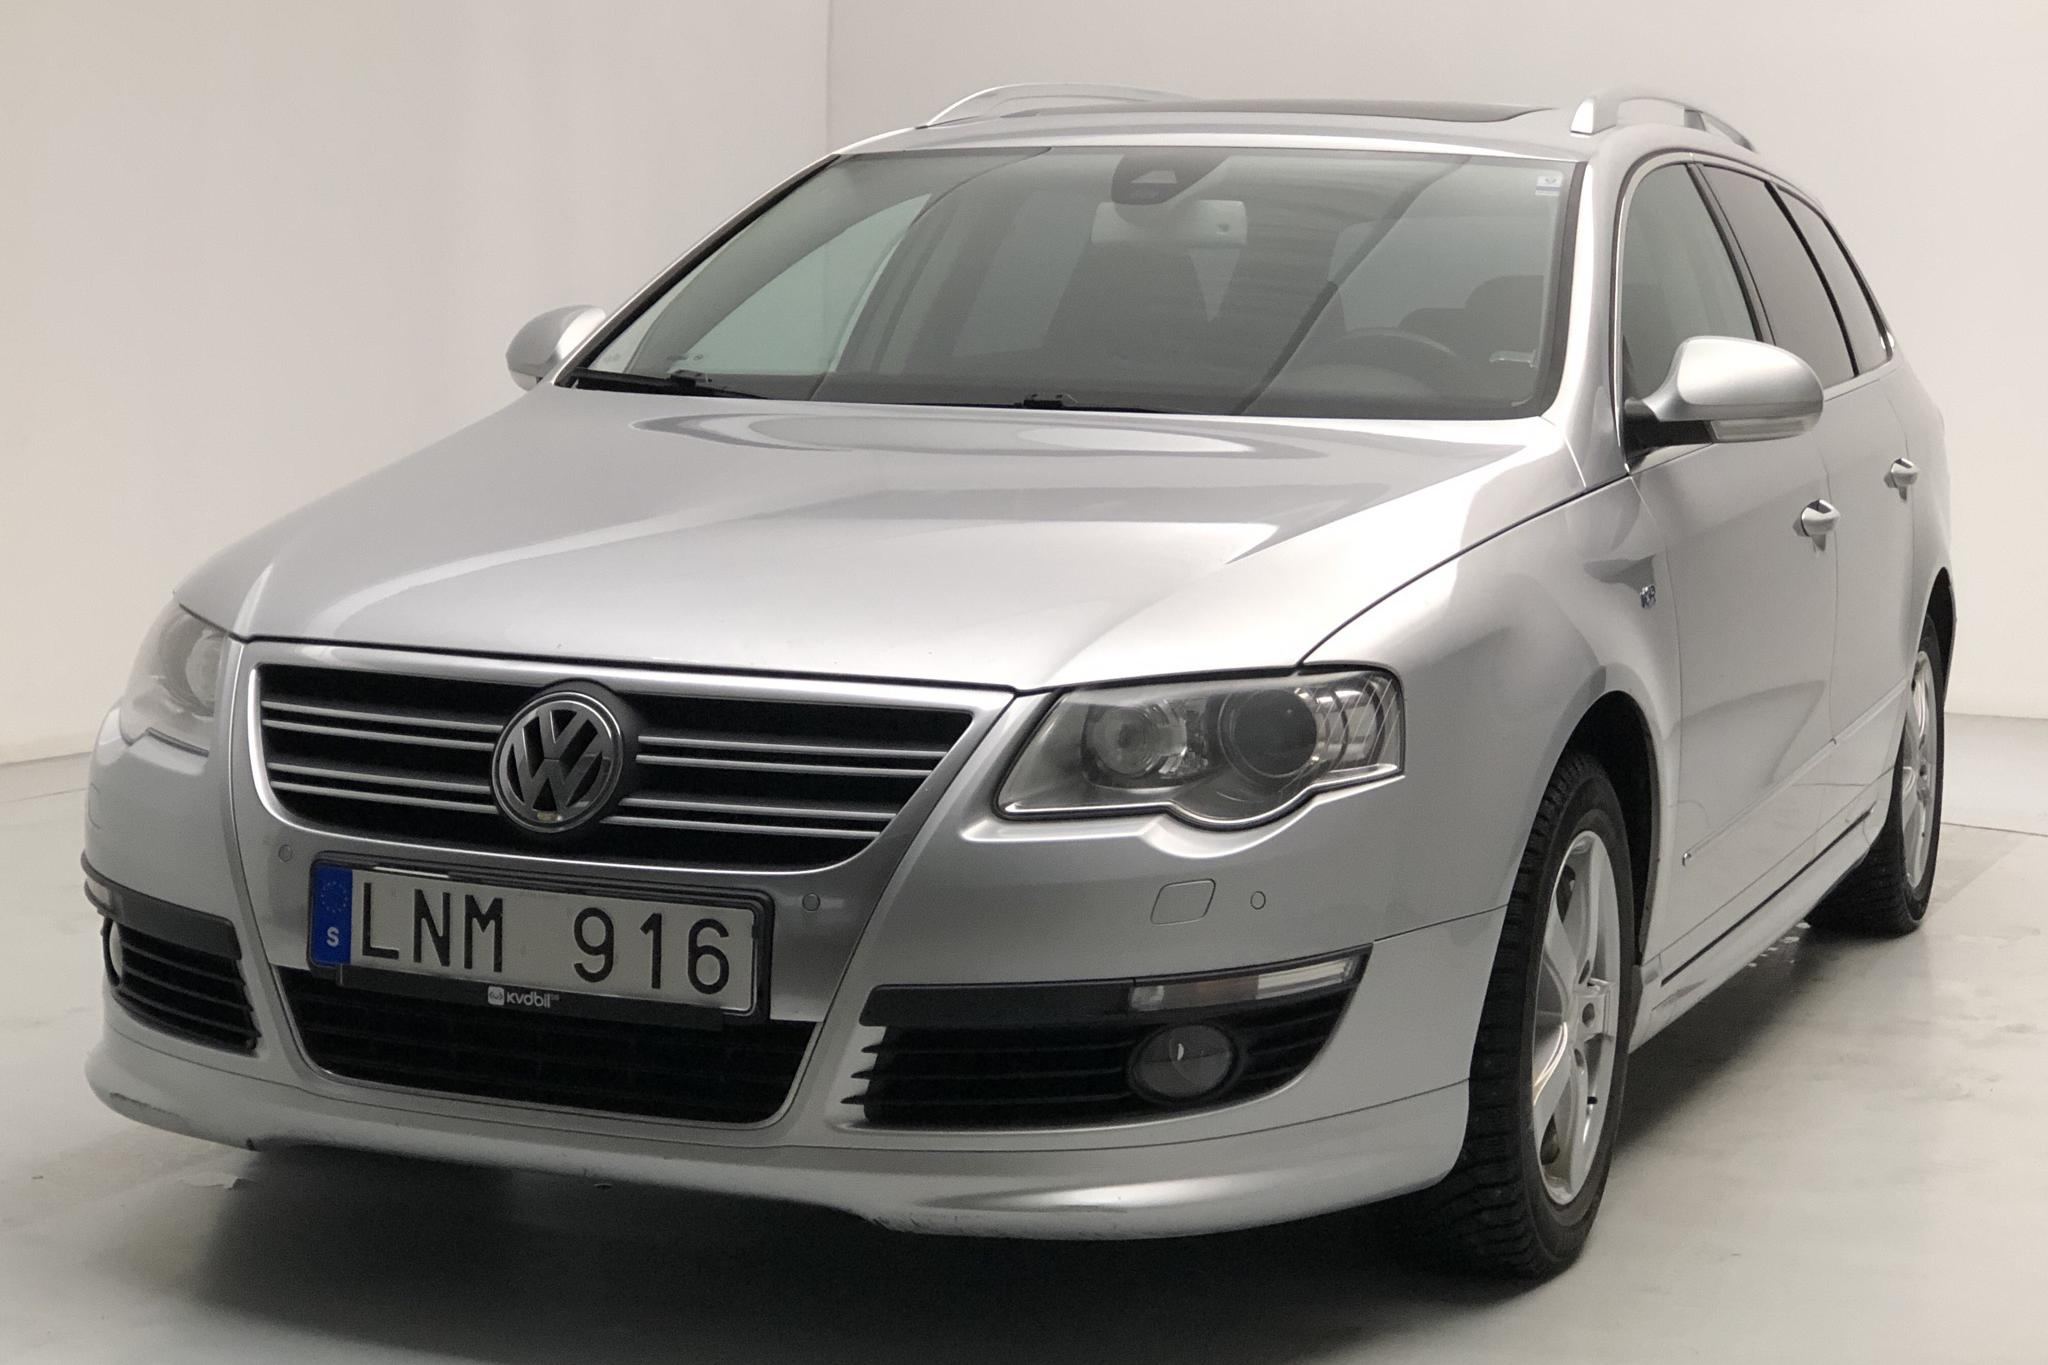 VW Passat 1.4 TSI EcoFuel Variant (150hk) - 169 470 km - Automatic - silver - 2010